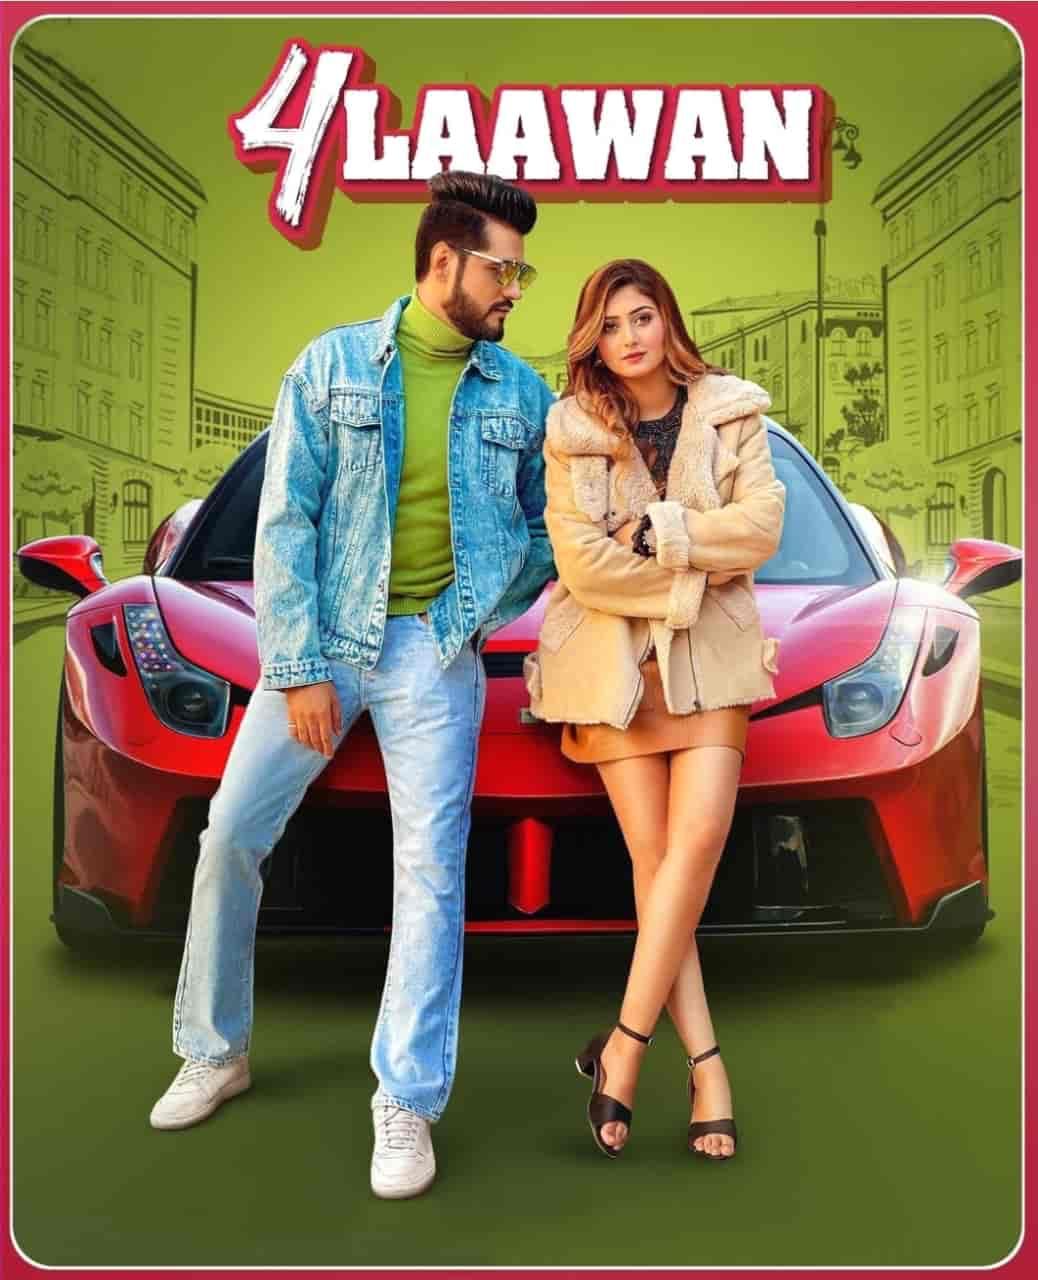 4 Laawan Punjabi Song Lyrics Vibhass